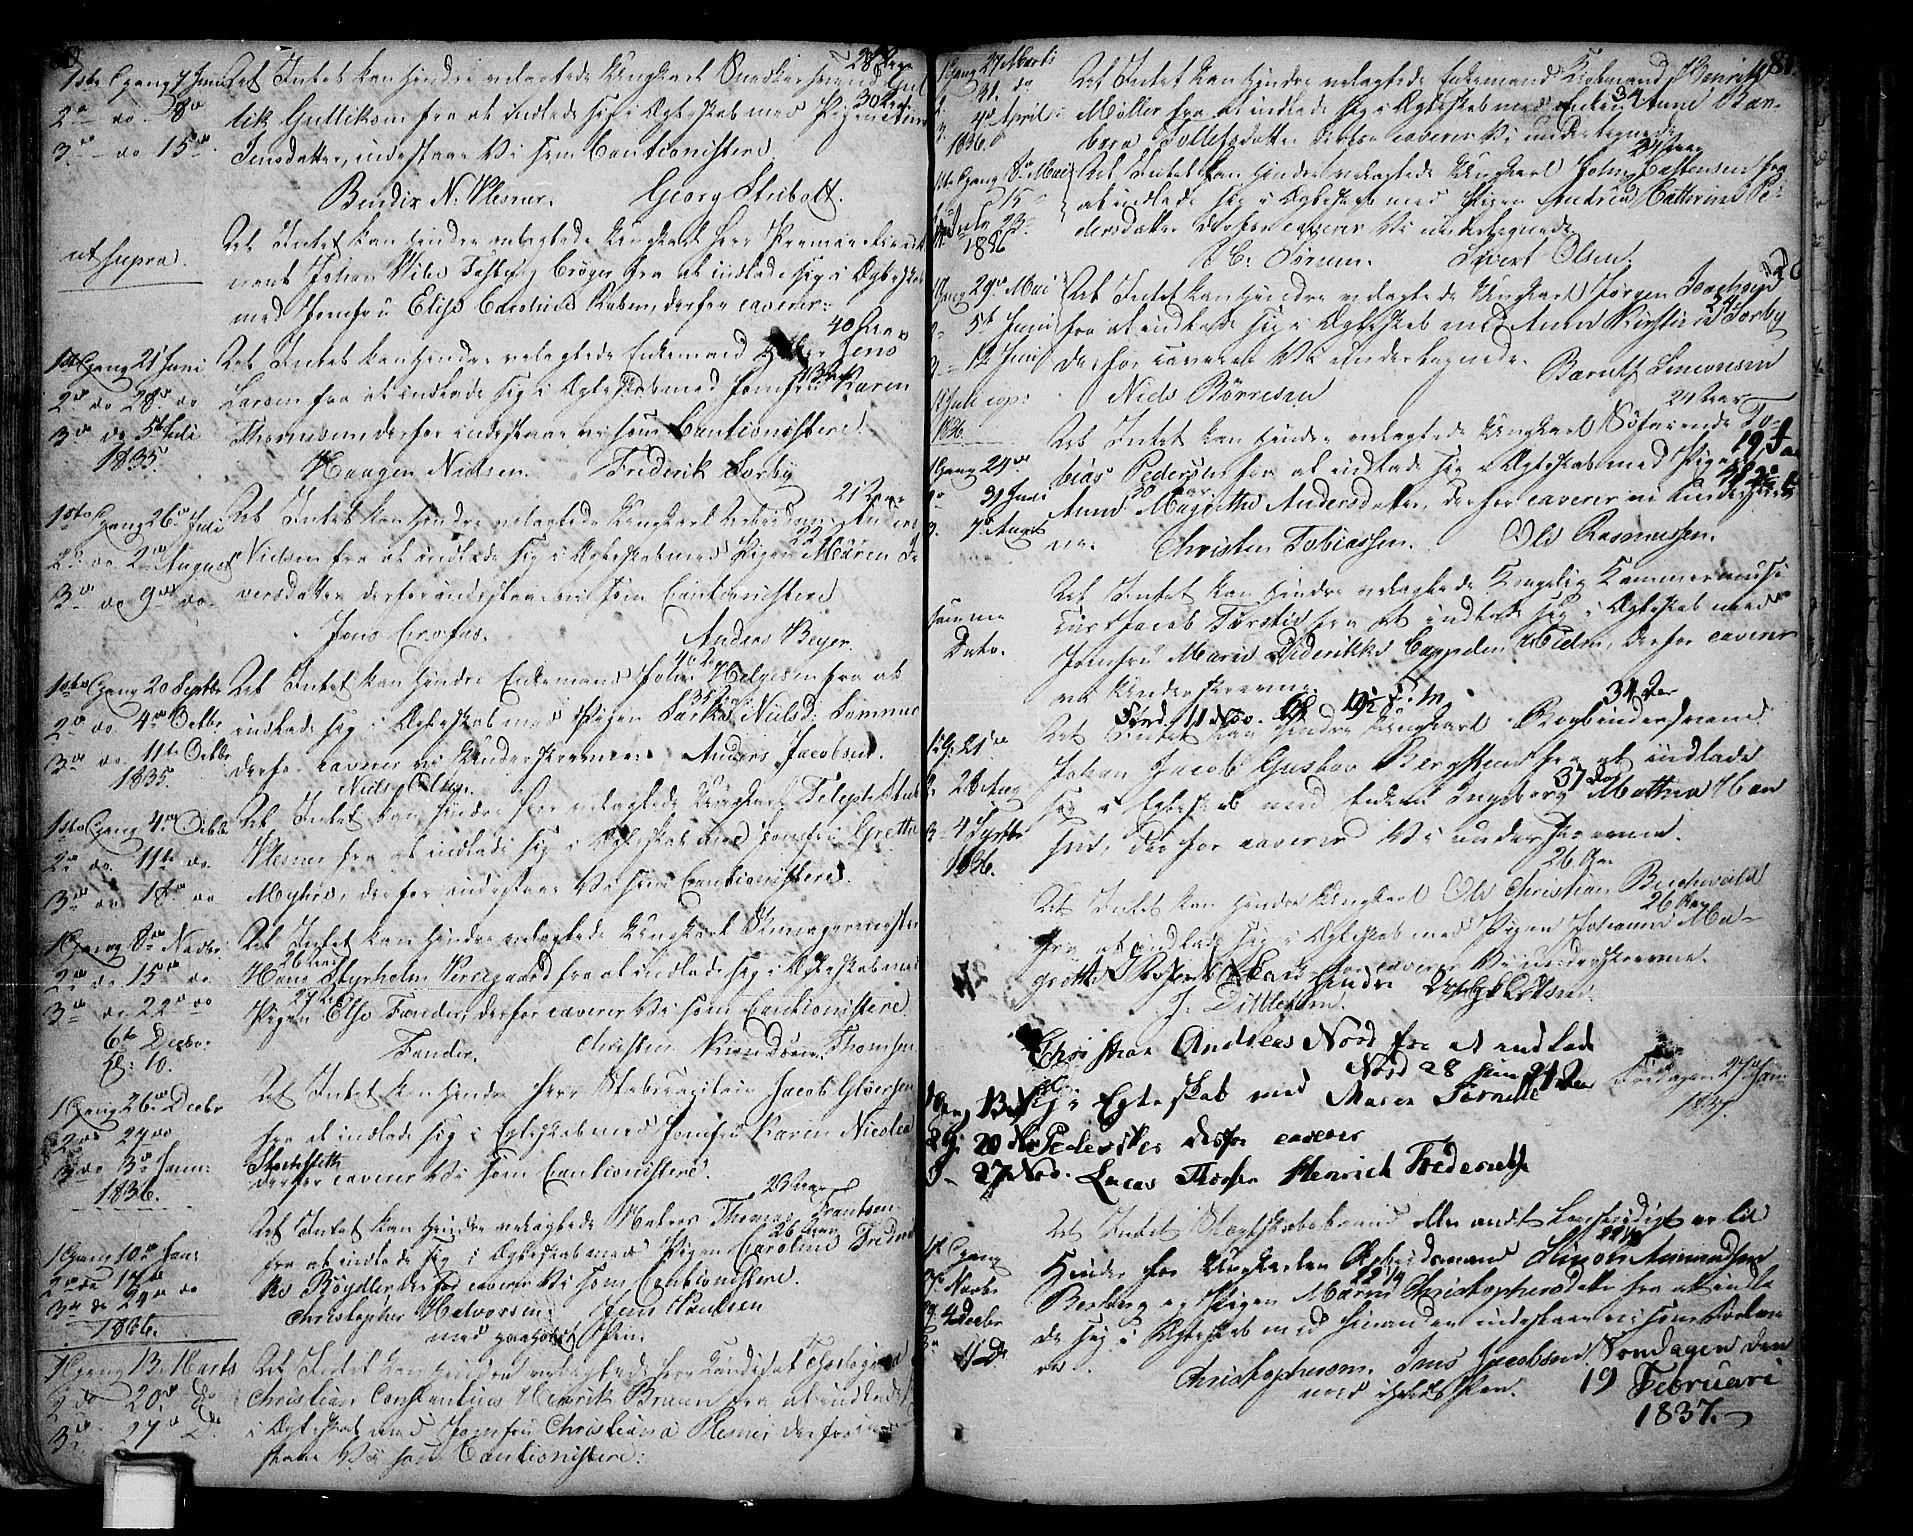 SAKO, Skien kirkebøker, F/Fa/L0004: Parish register (official) no. 4, 1792-1814, p. 80-81